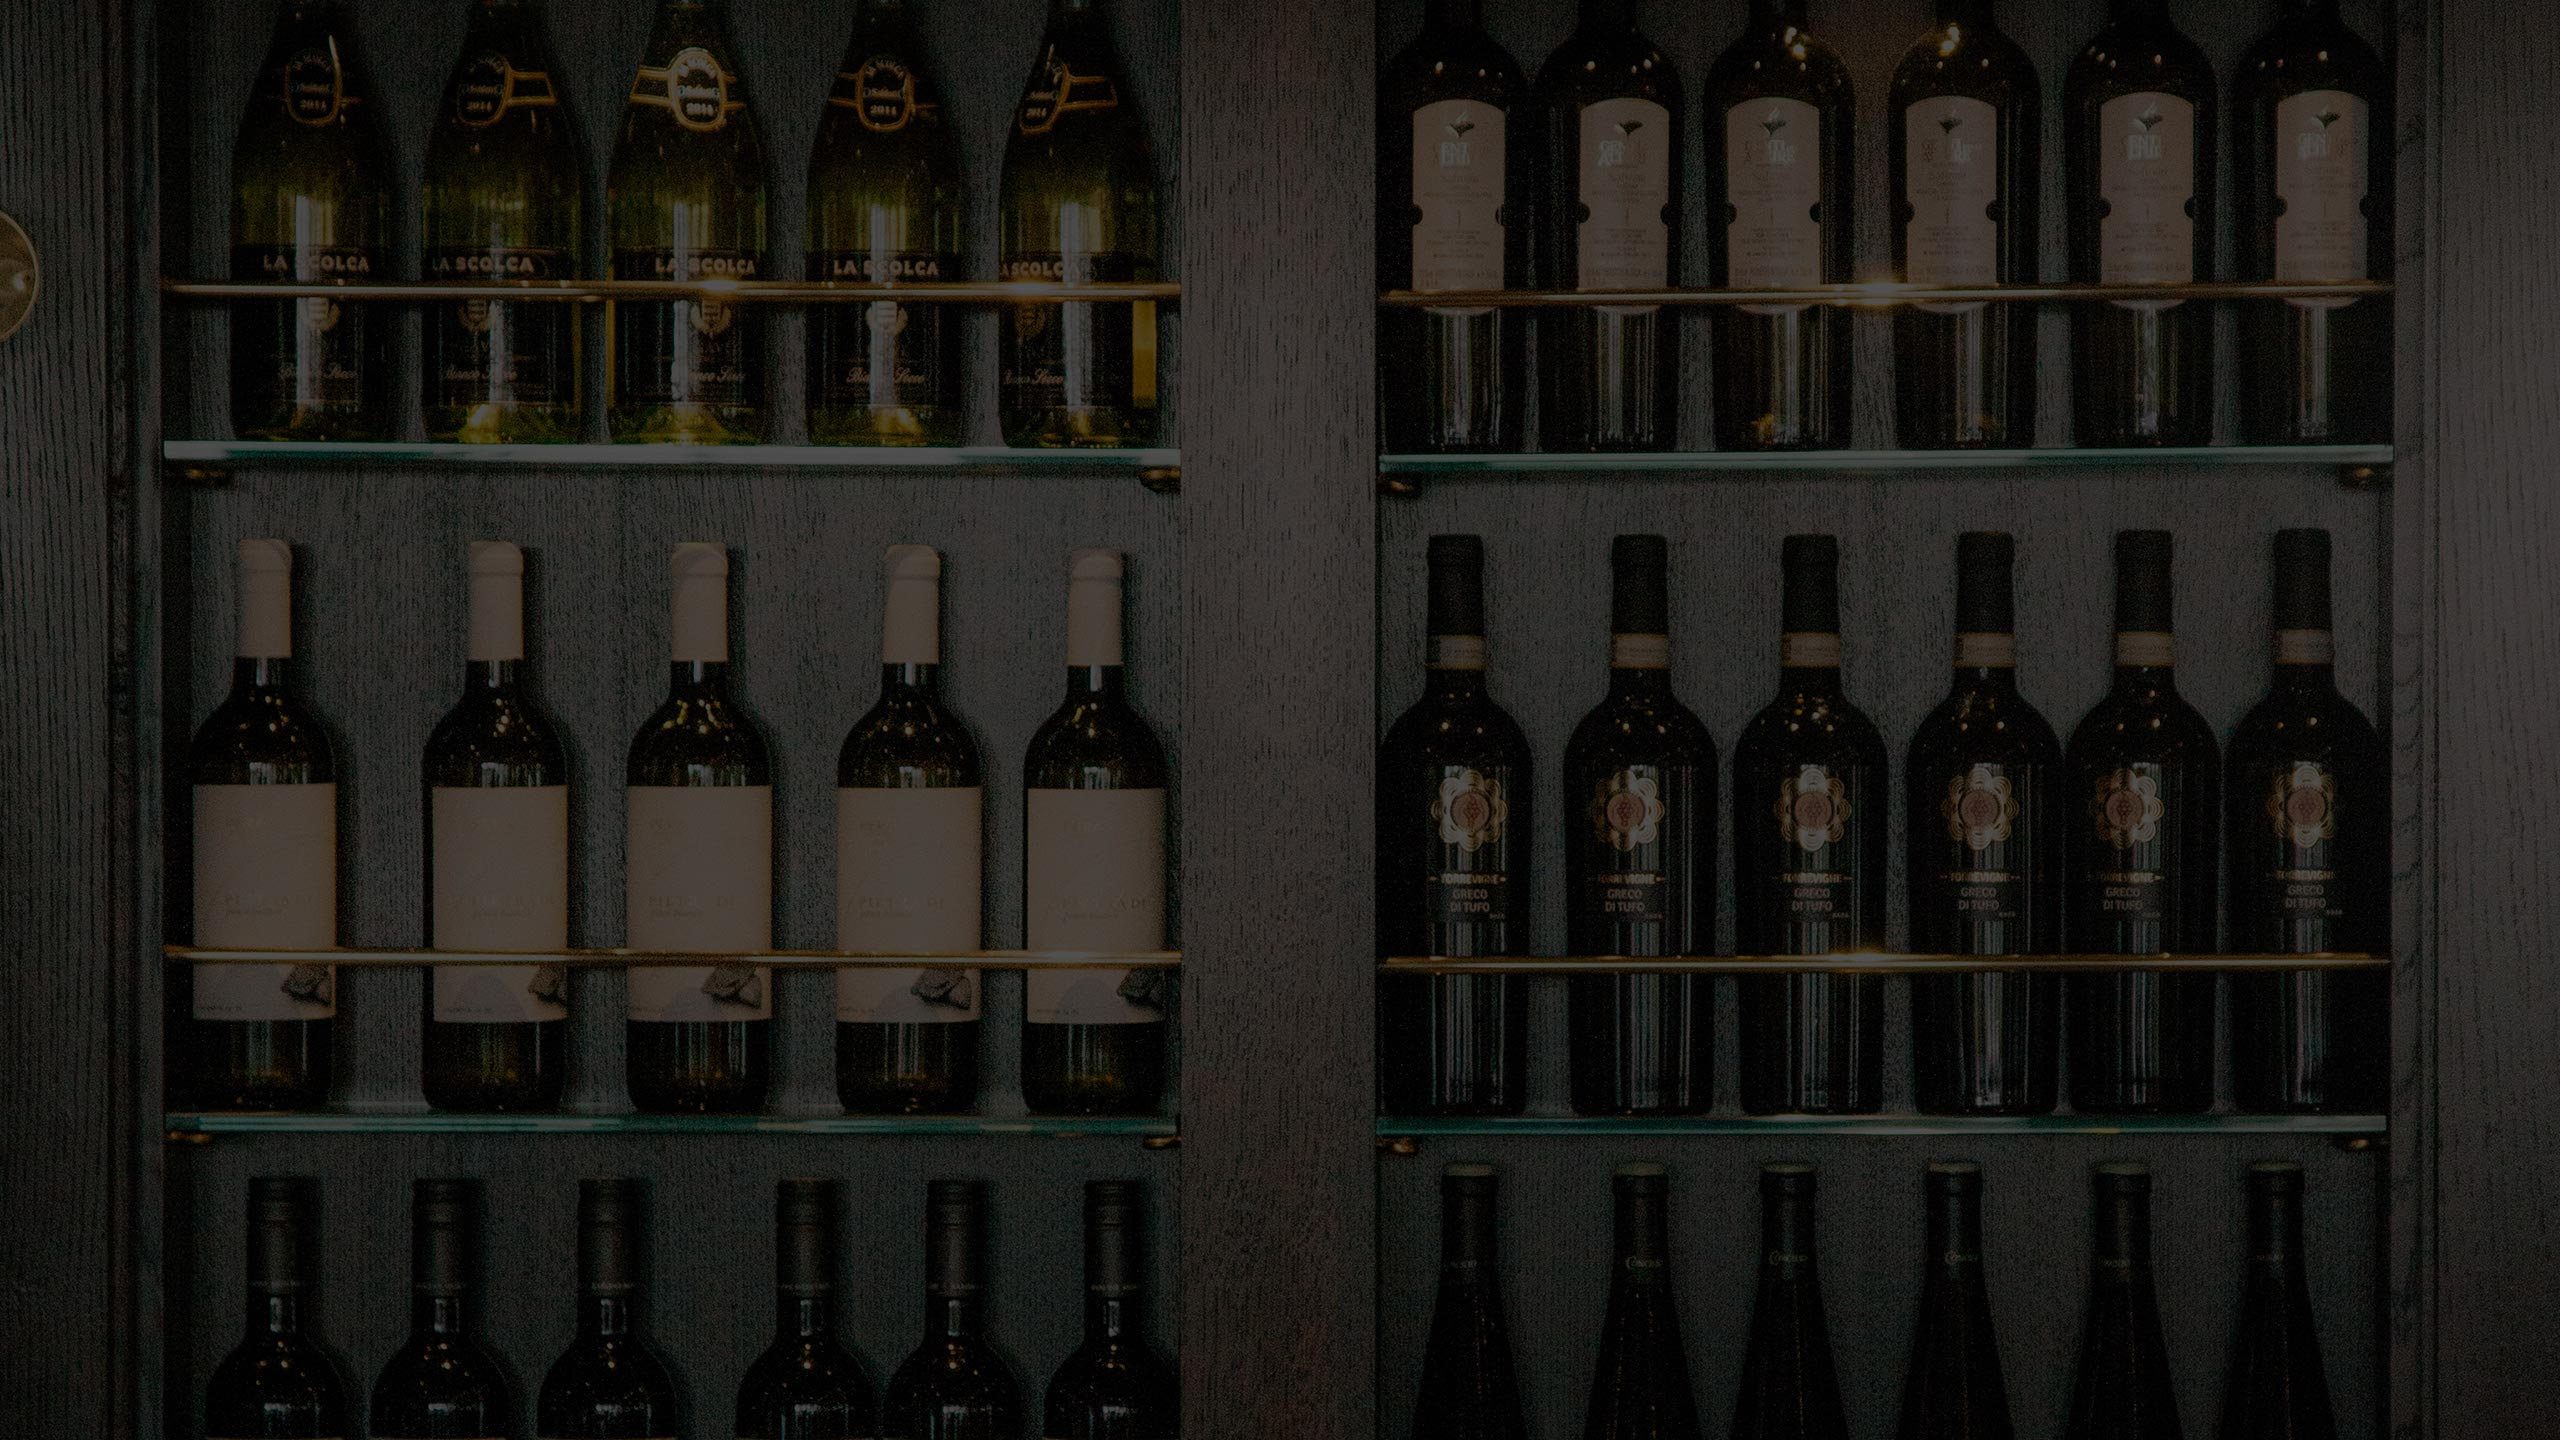 Italian wine Wine Rack inside Piccolino e vino southside